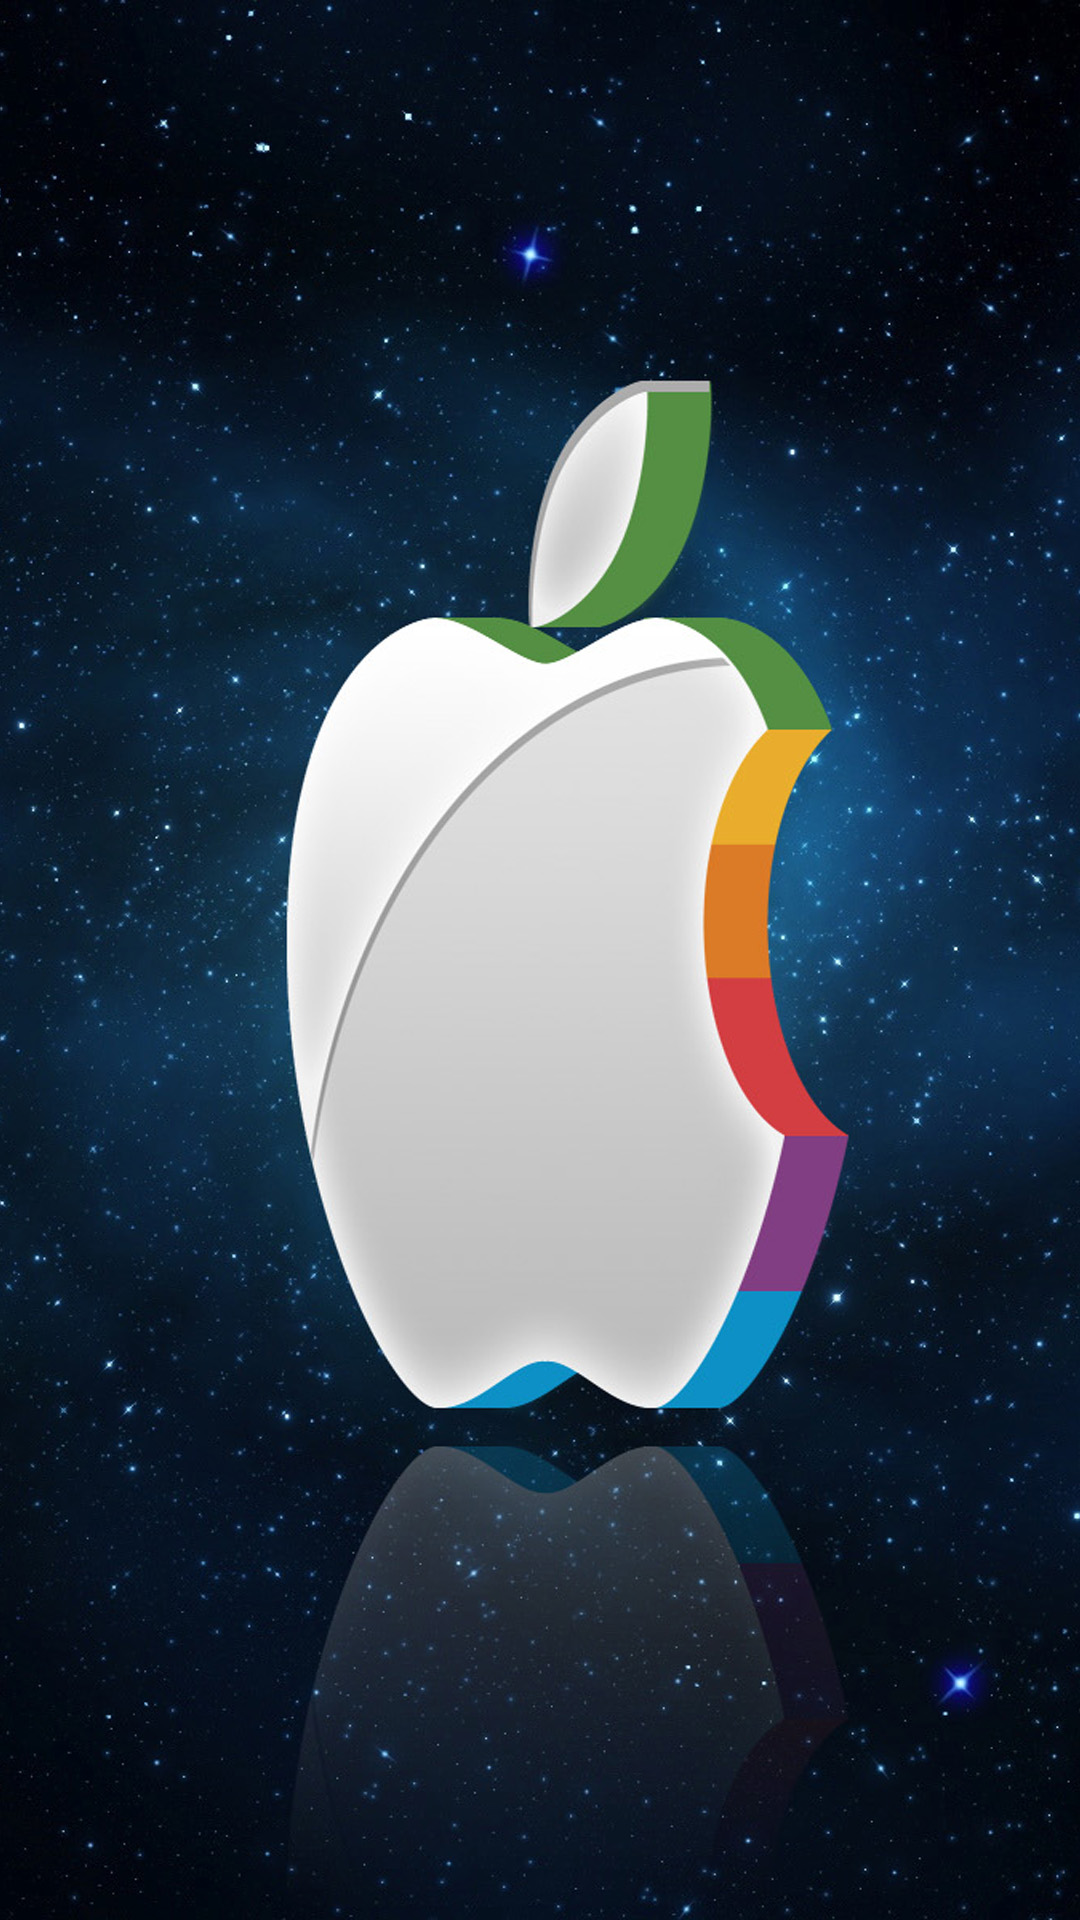 3d apple logo in space